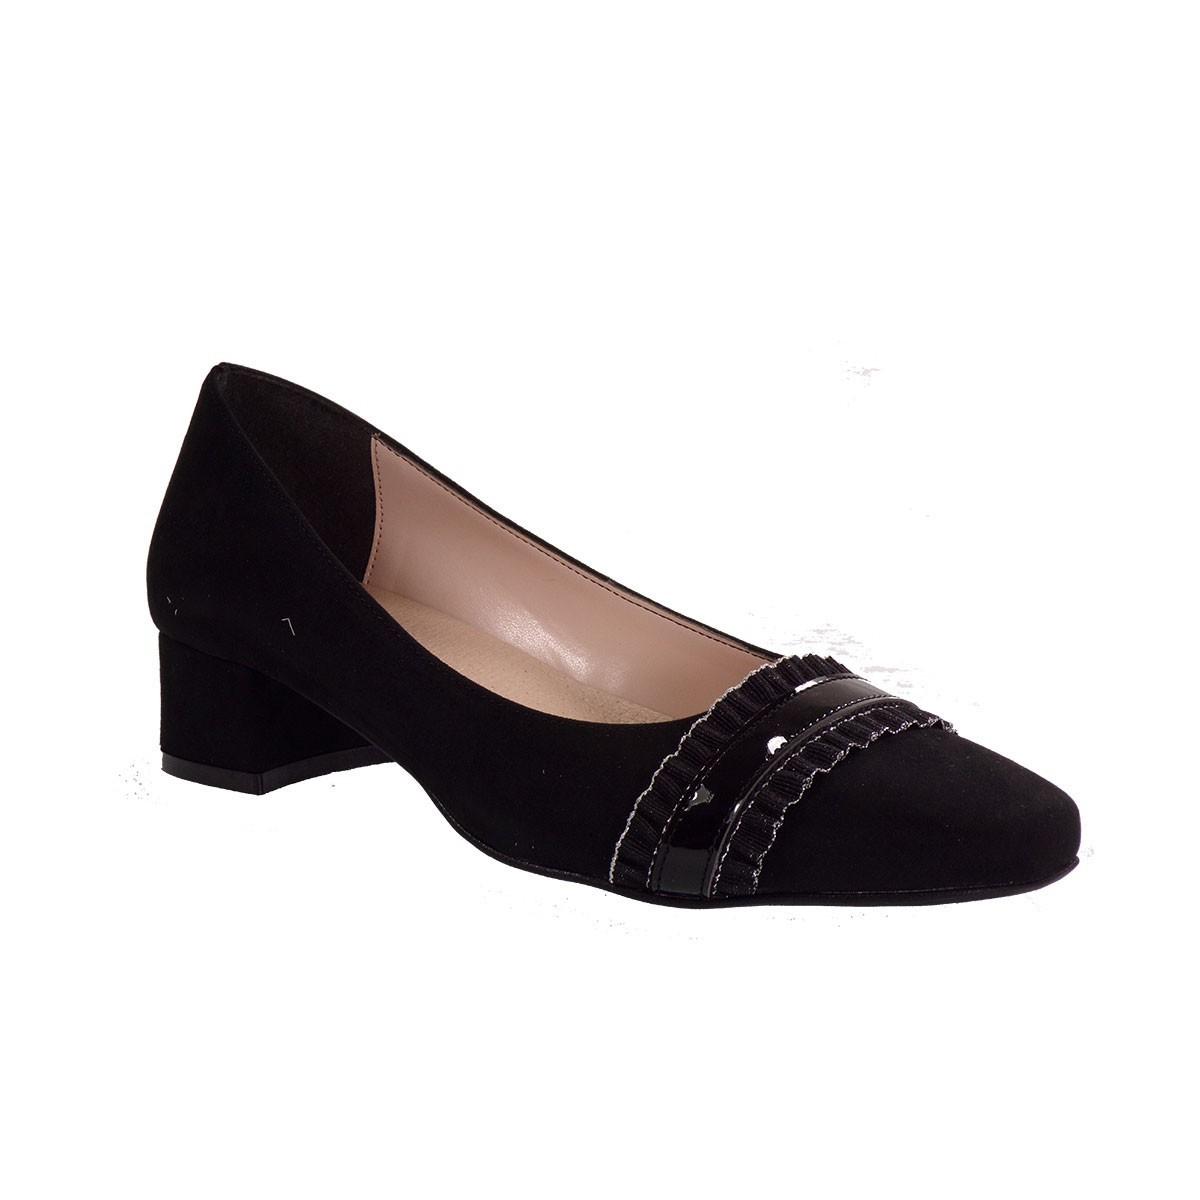 Katia Shoes Γυναικεία Παπούτσια Γόβες 11-5037 Μαύρο